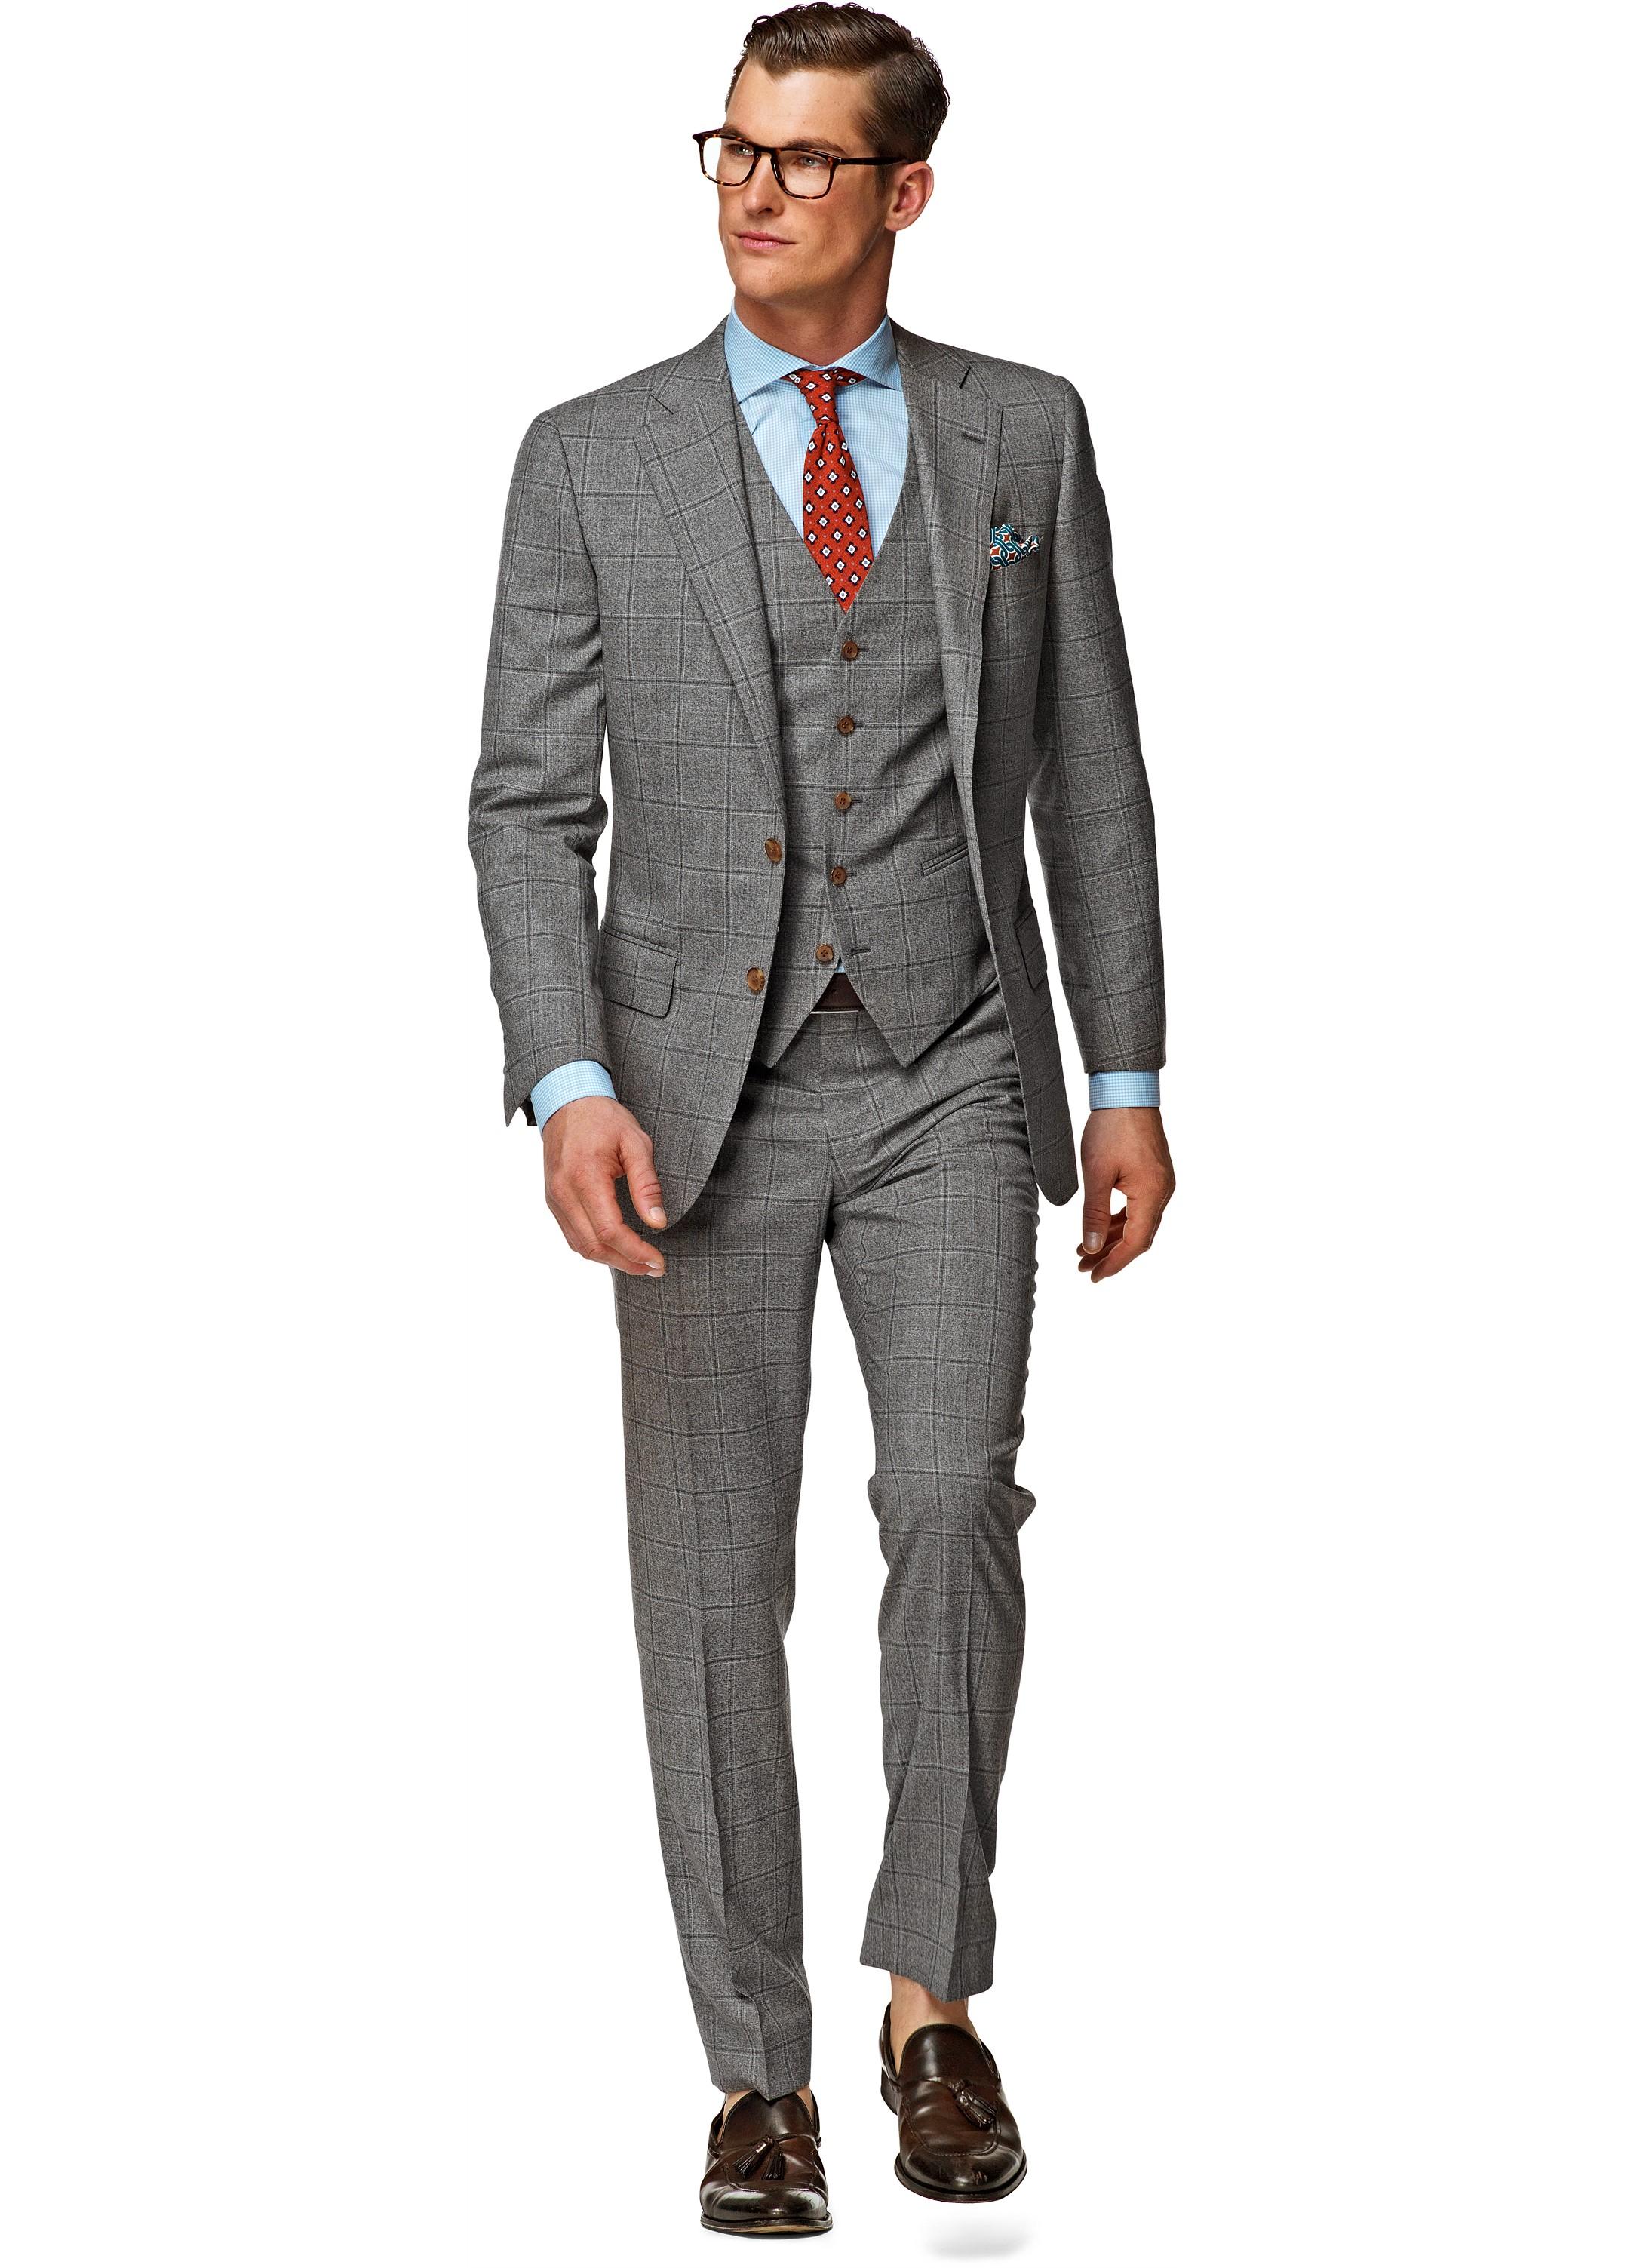 Matching Shirt Patterns To Windowpane Suit Advice Ask